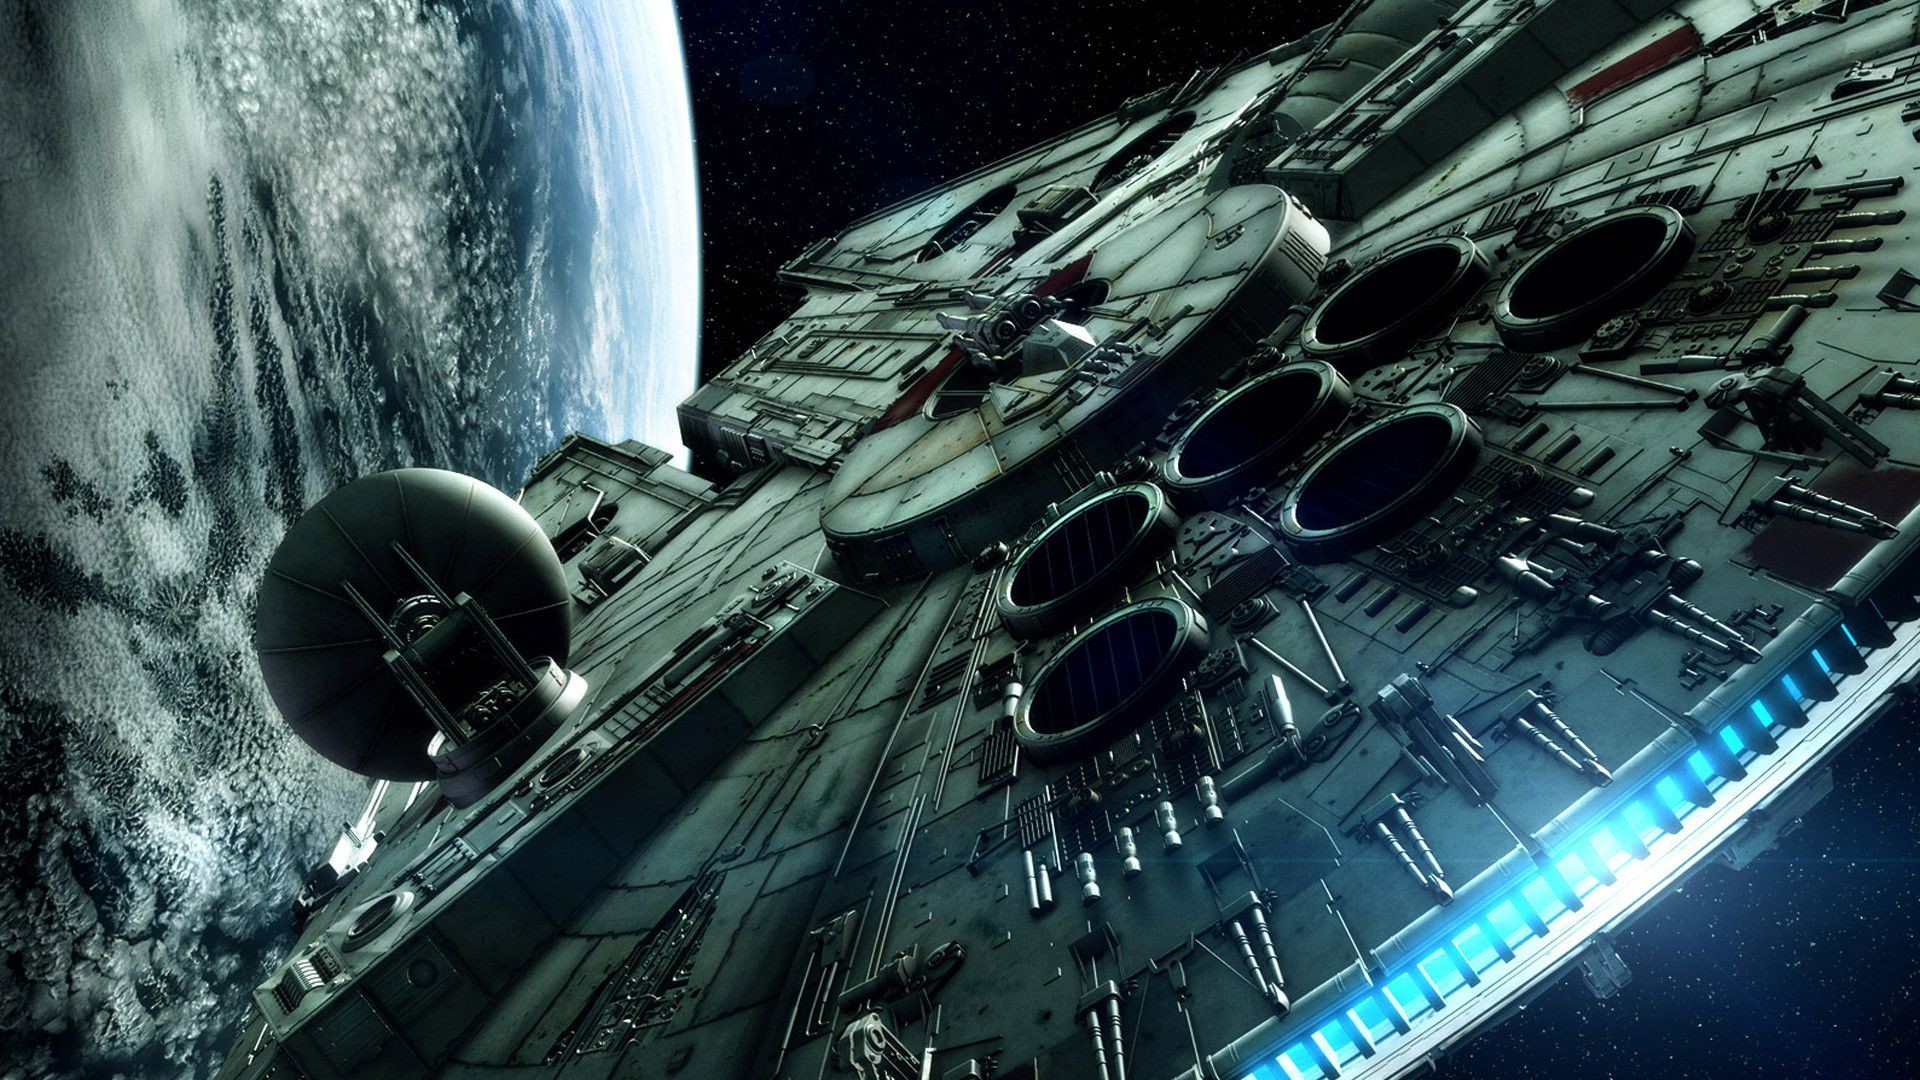 Star Wars Wallpapers 1080p – Wallpaper Cave